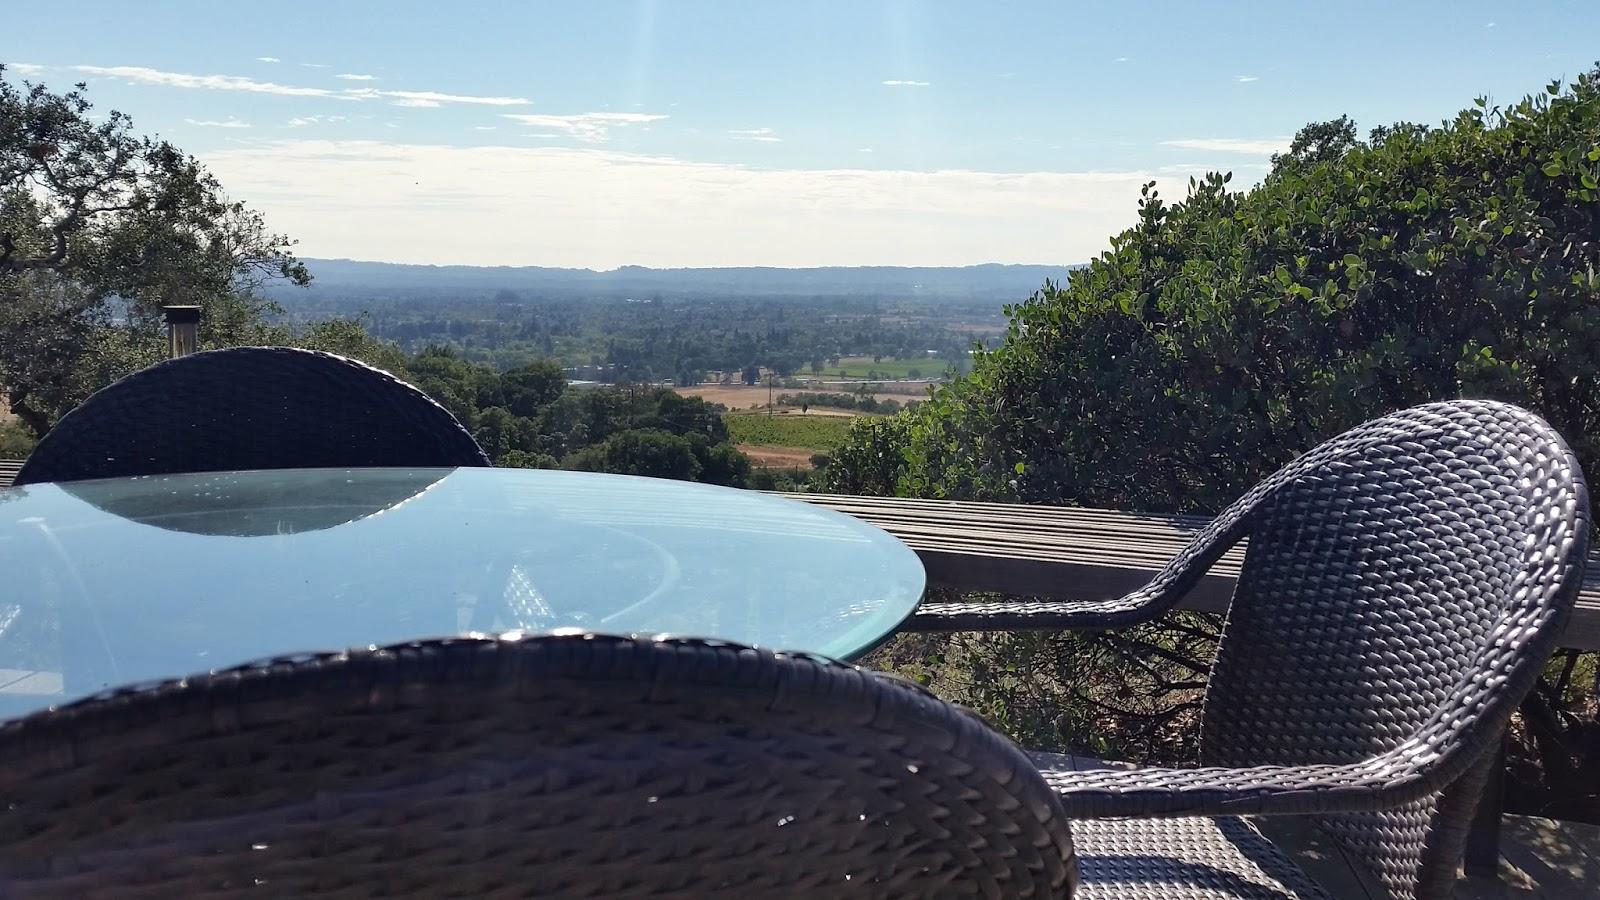 Paradise Ridge Winery